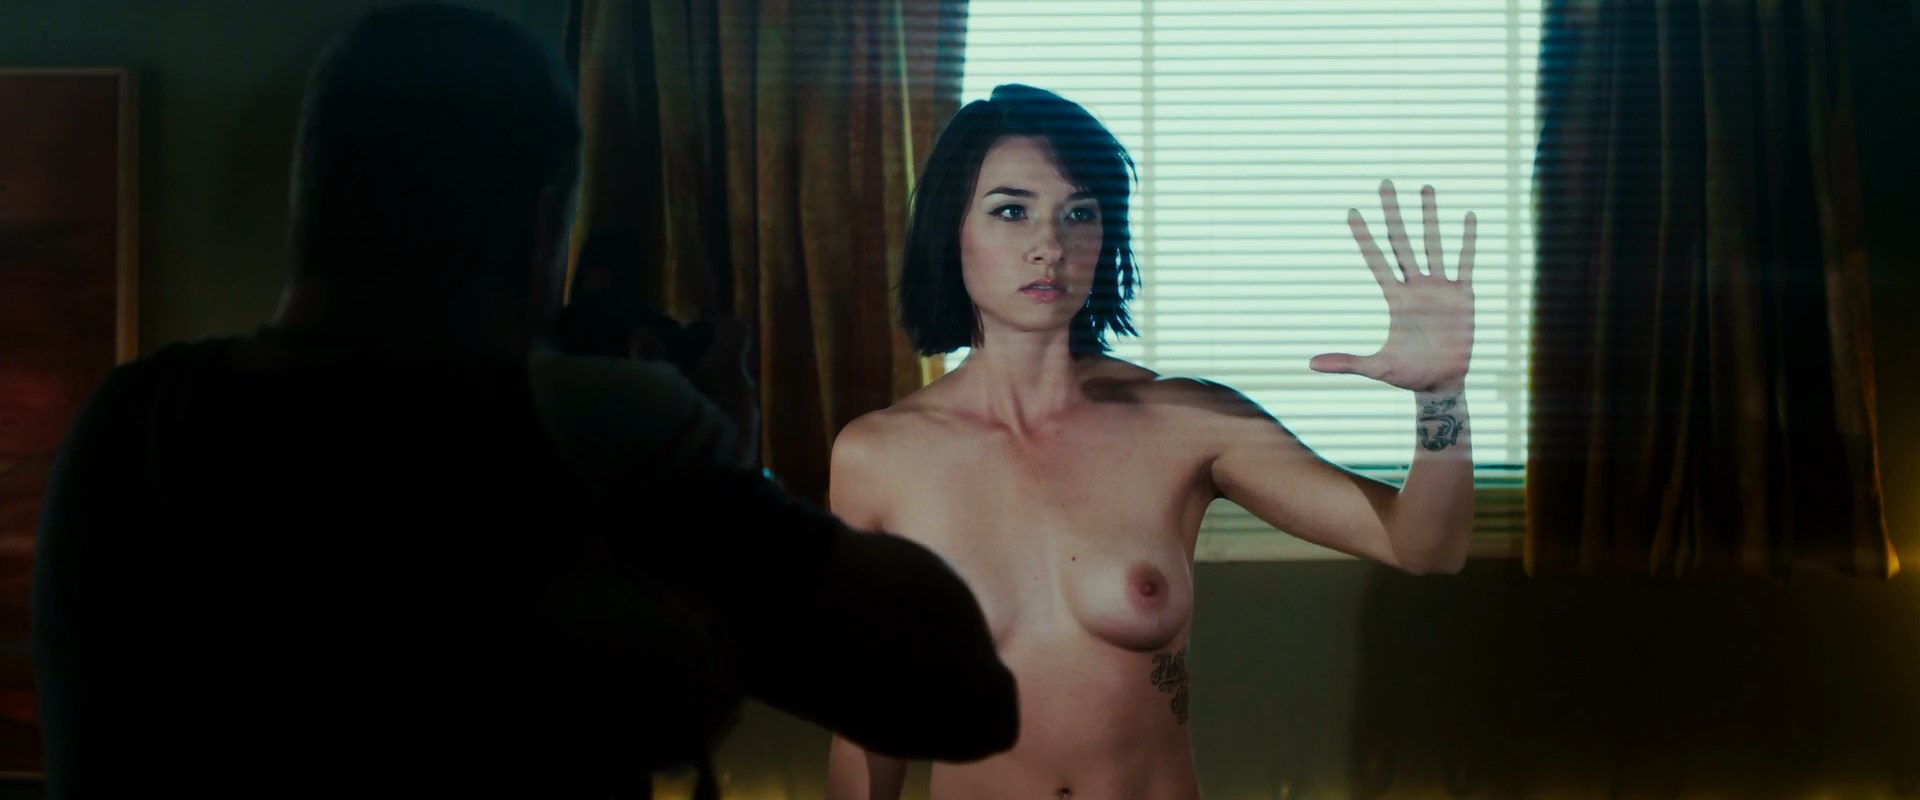 Courtney jane white nude